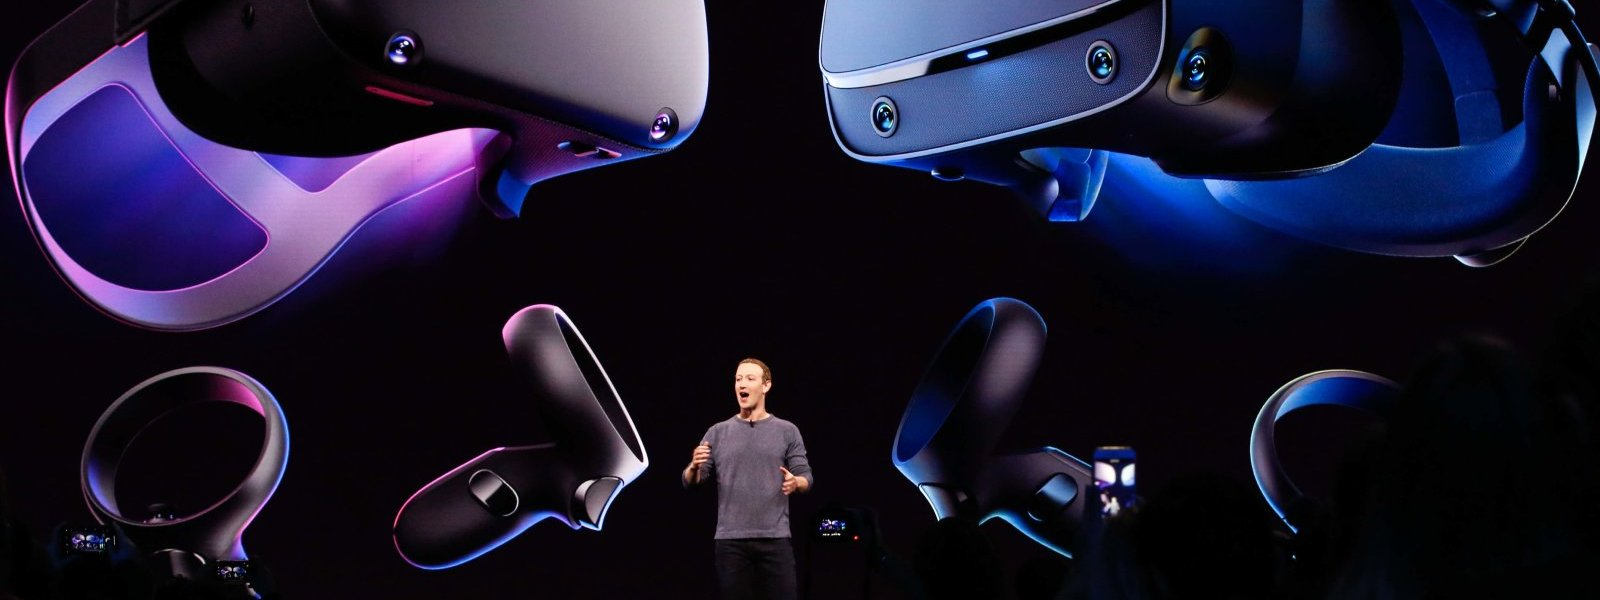 Mark Zuckerberg présentation d'appareils Oculus